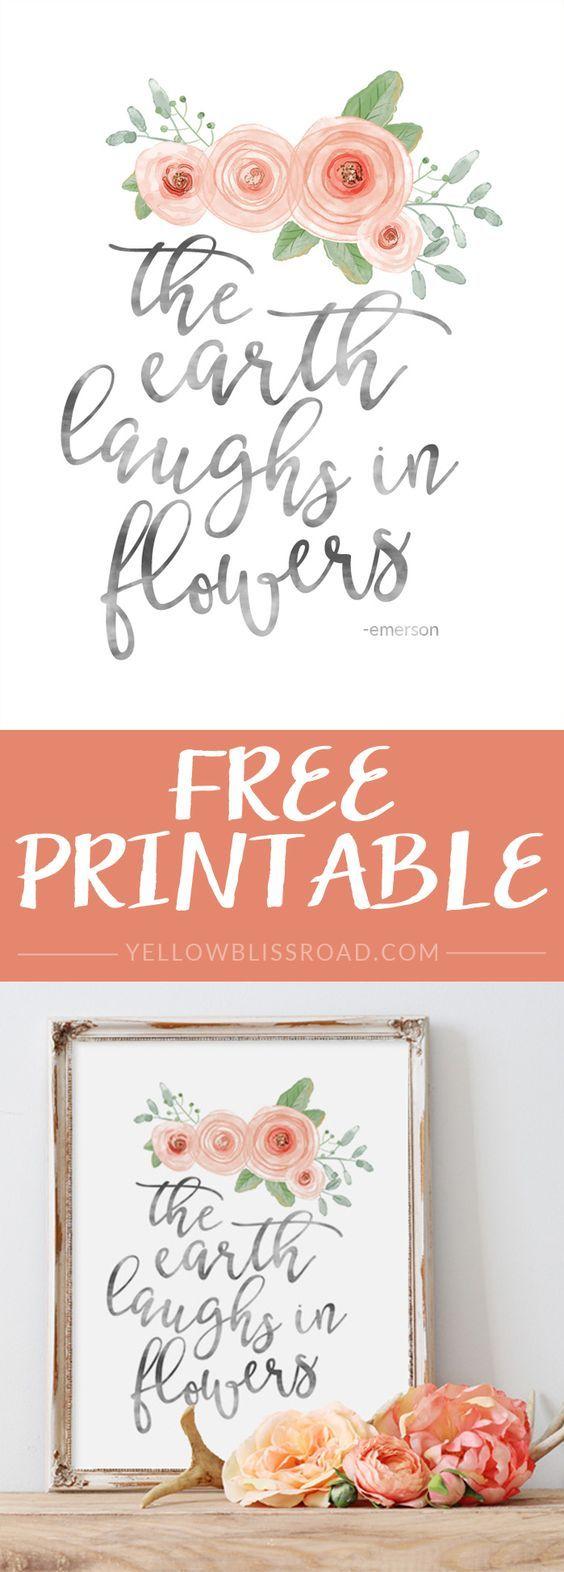 Citaten Kunst Free : Free spring printable kalligrafie spreuken en trouw